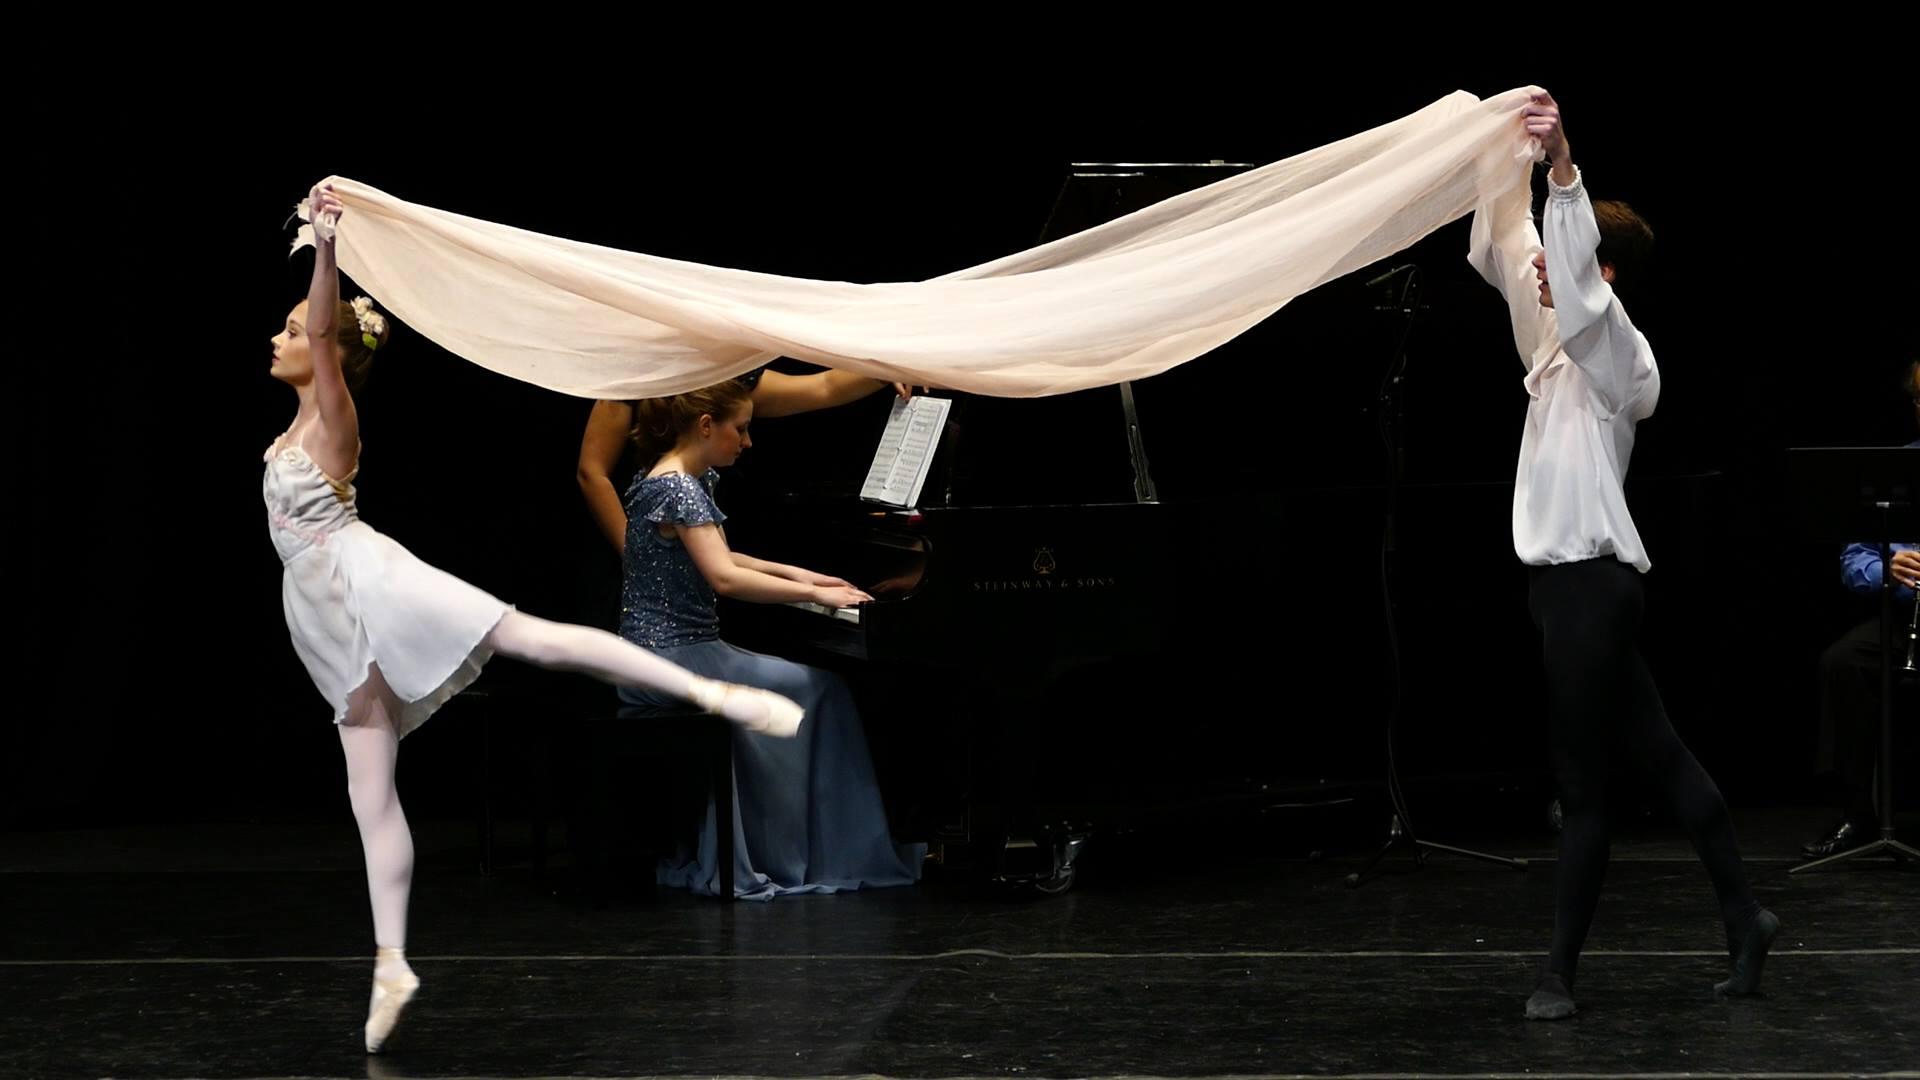 Dcs ballet